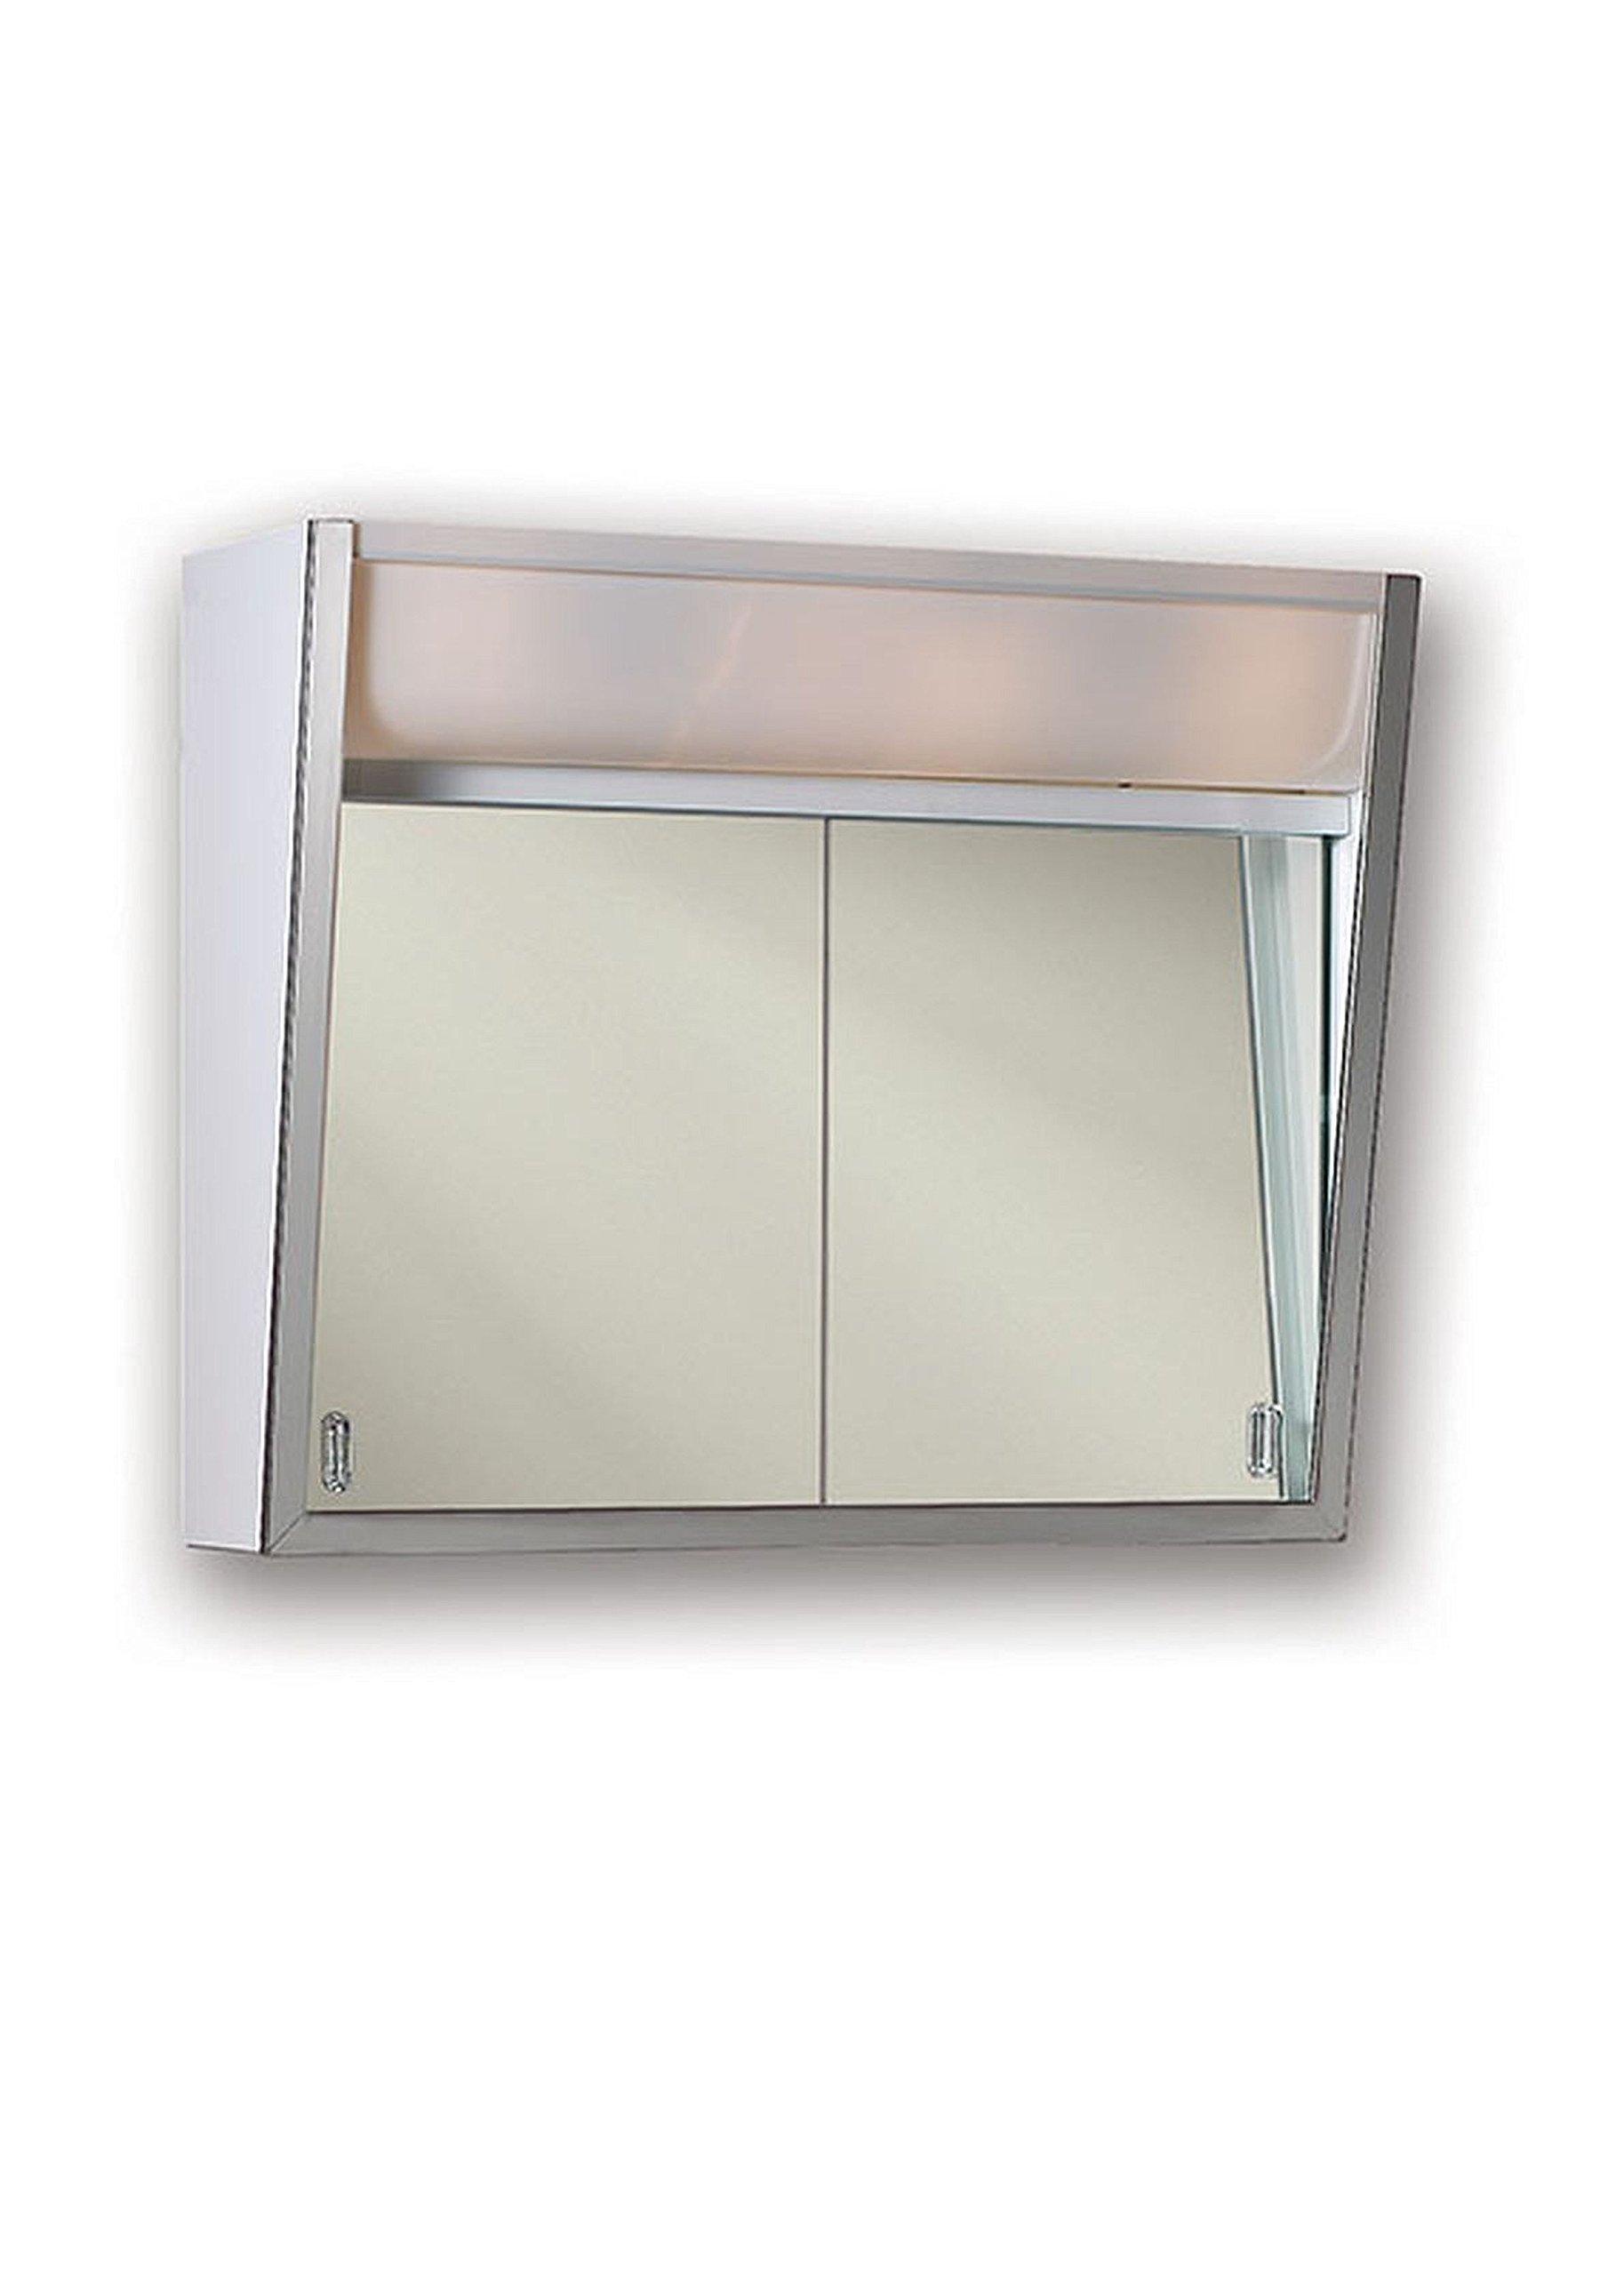 Jensen 323LPX Lighted 2-Sliding Doors Medicine Cabinet, 24'' x 19.5''